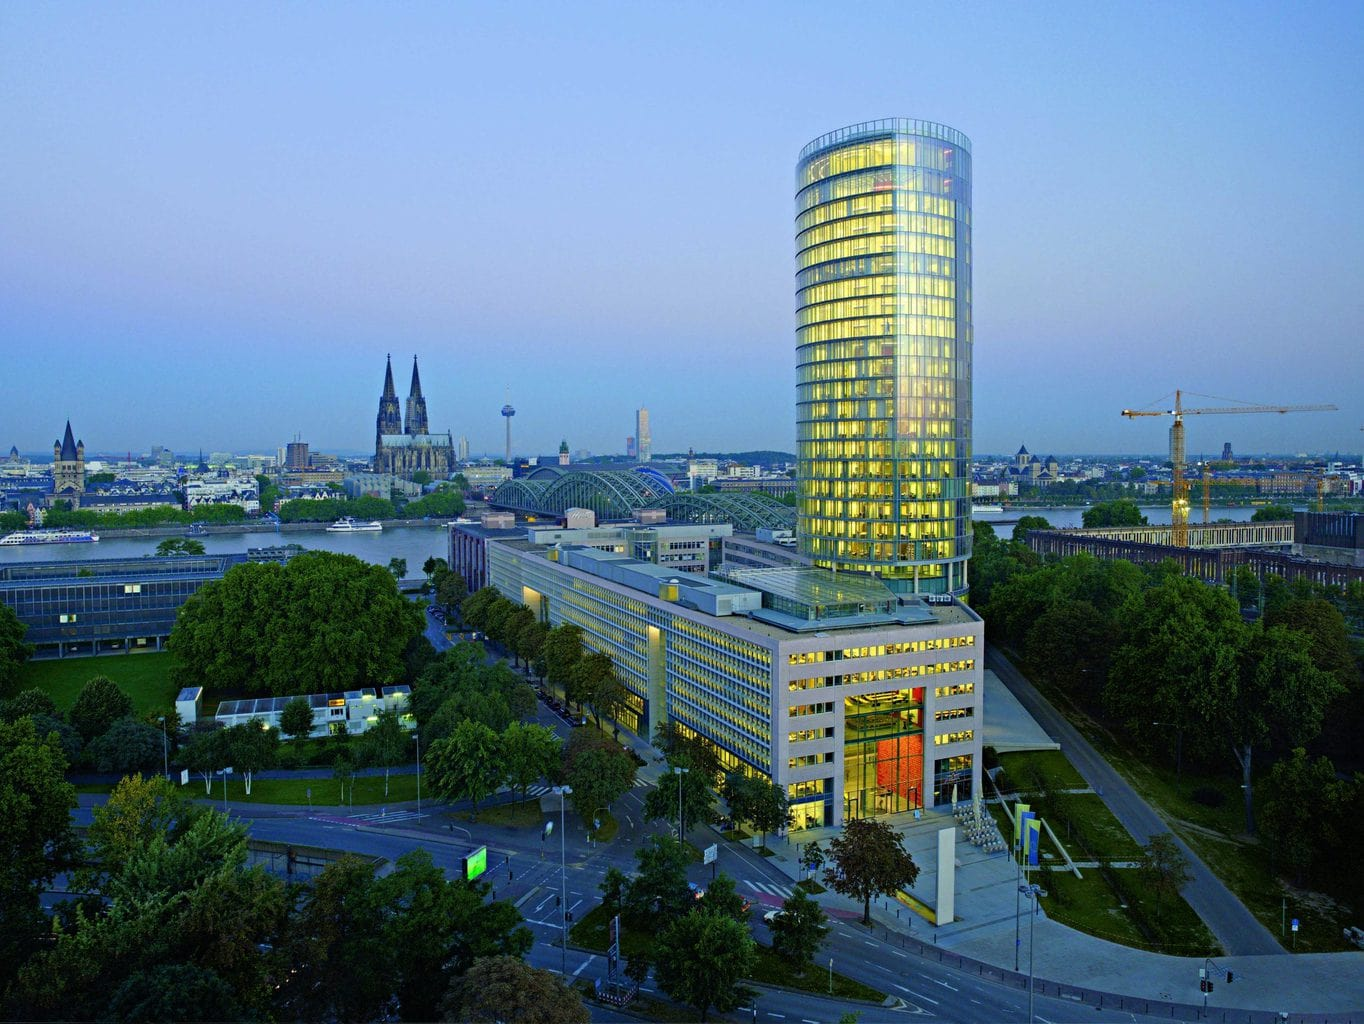 Kölntriangle van Dörte Gaterman in Keulen